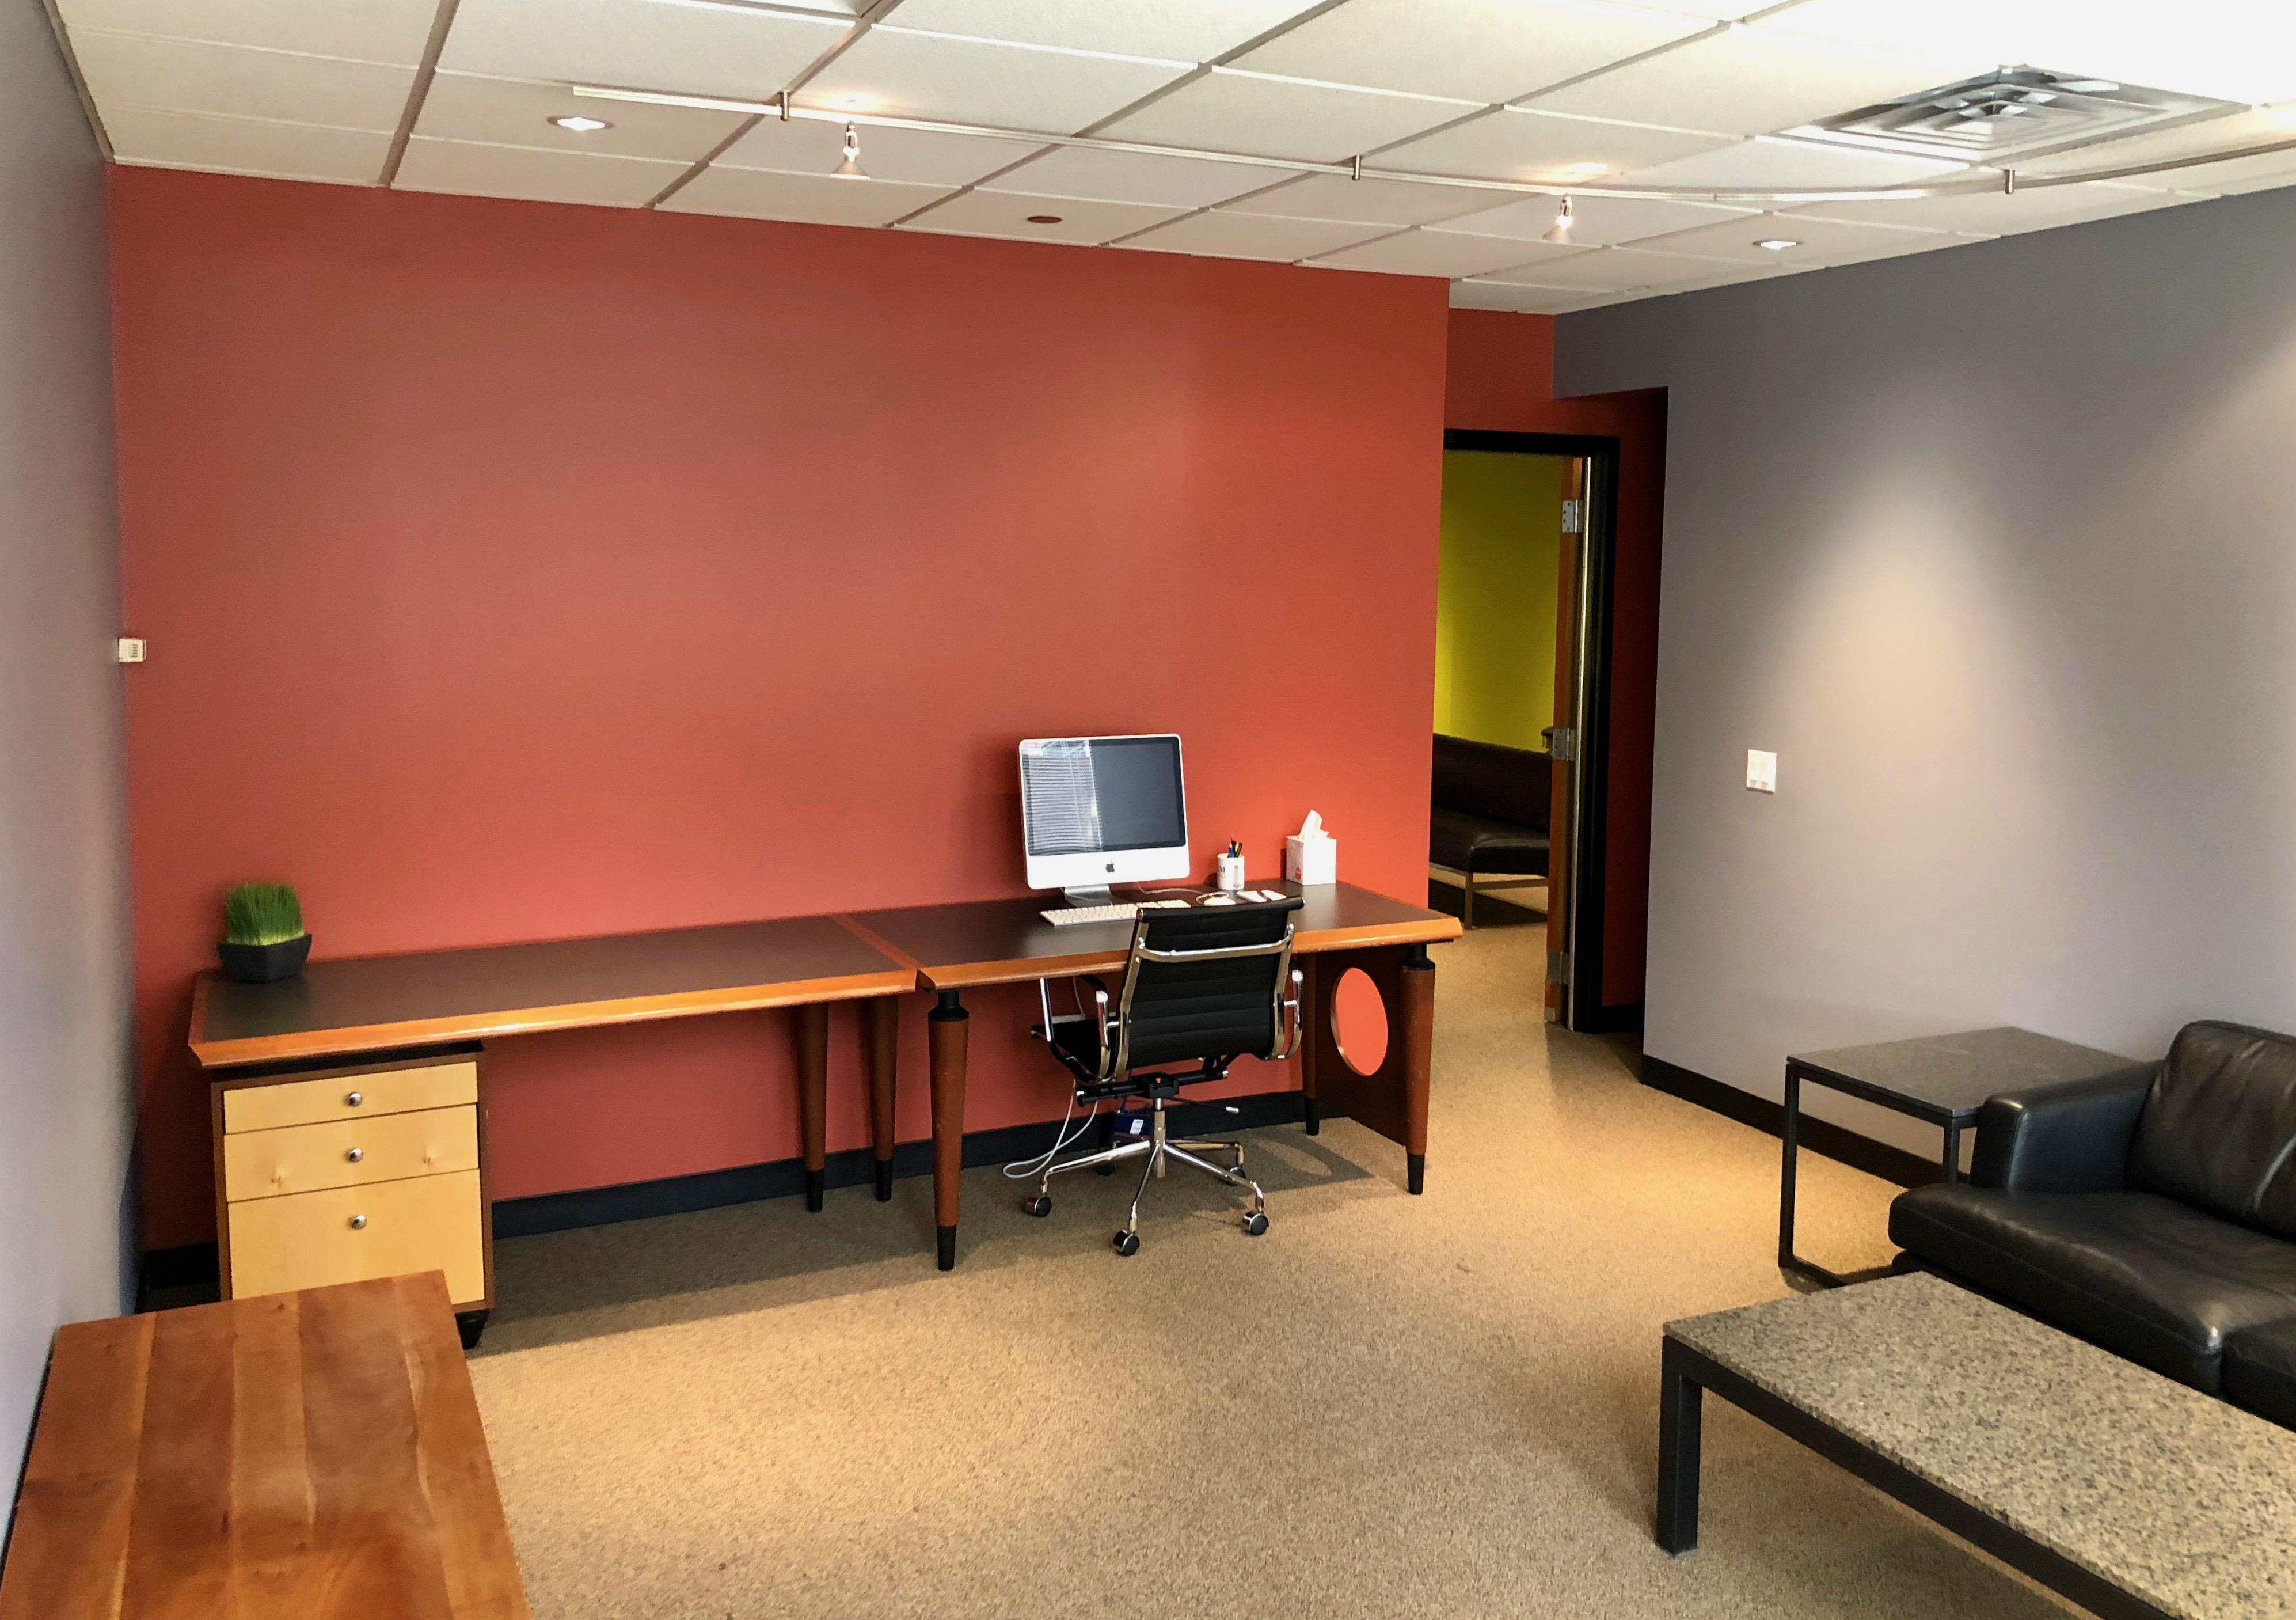 BAM Studios - Office 1